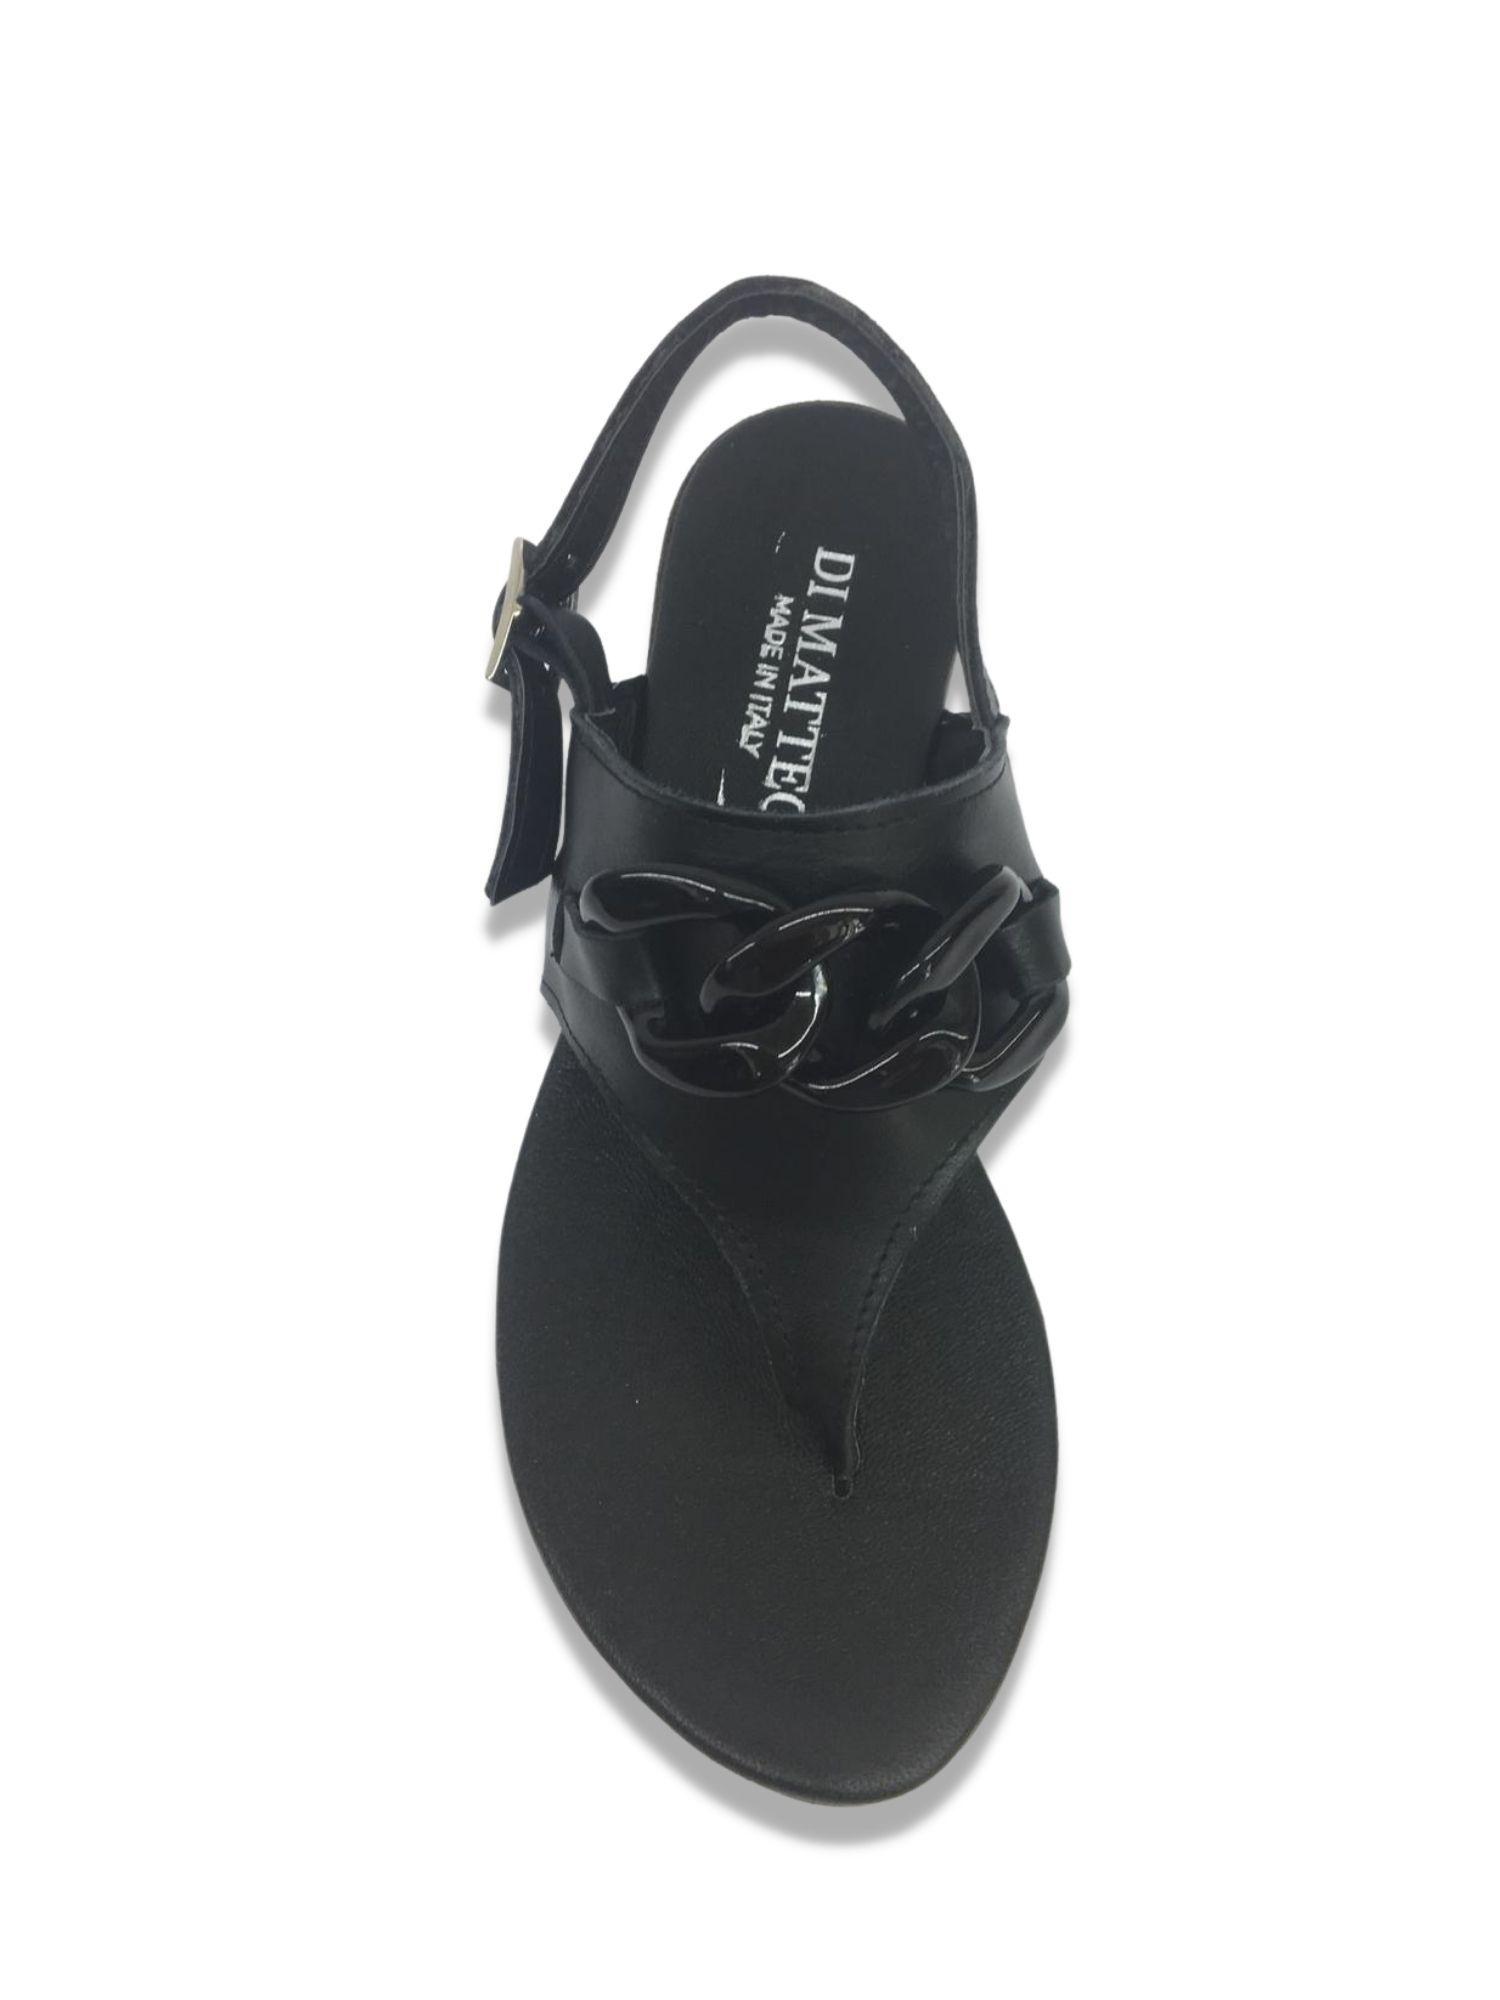 Sandalo infradito Made in Italy 203 Nero alto